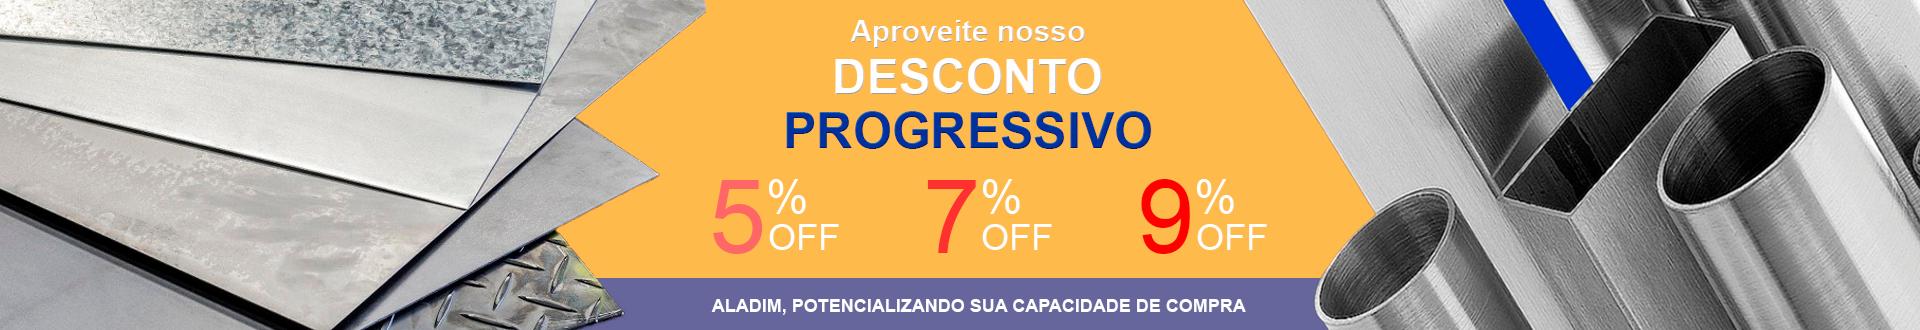 2019 08 21 banner 1920x330 fundo laranja - desconto progressivo - 5-7-9%